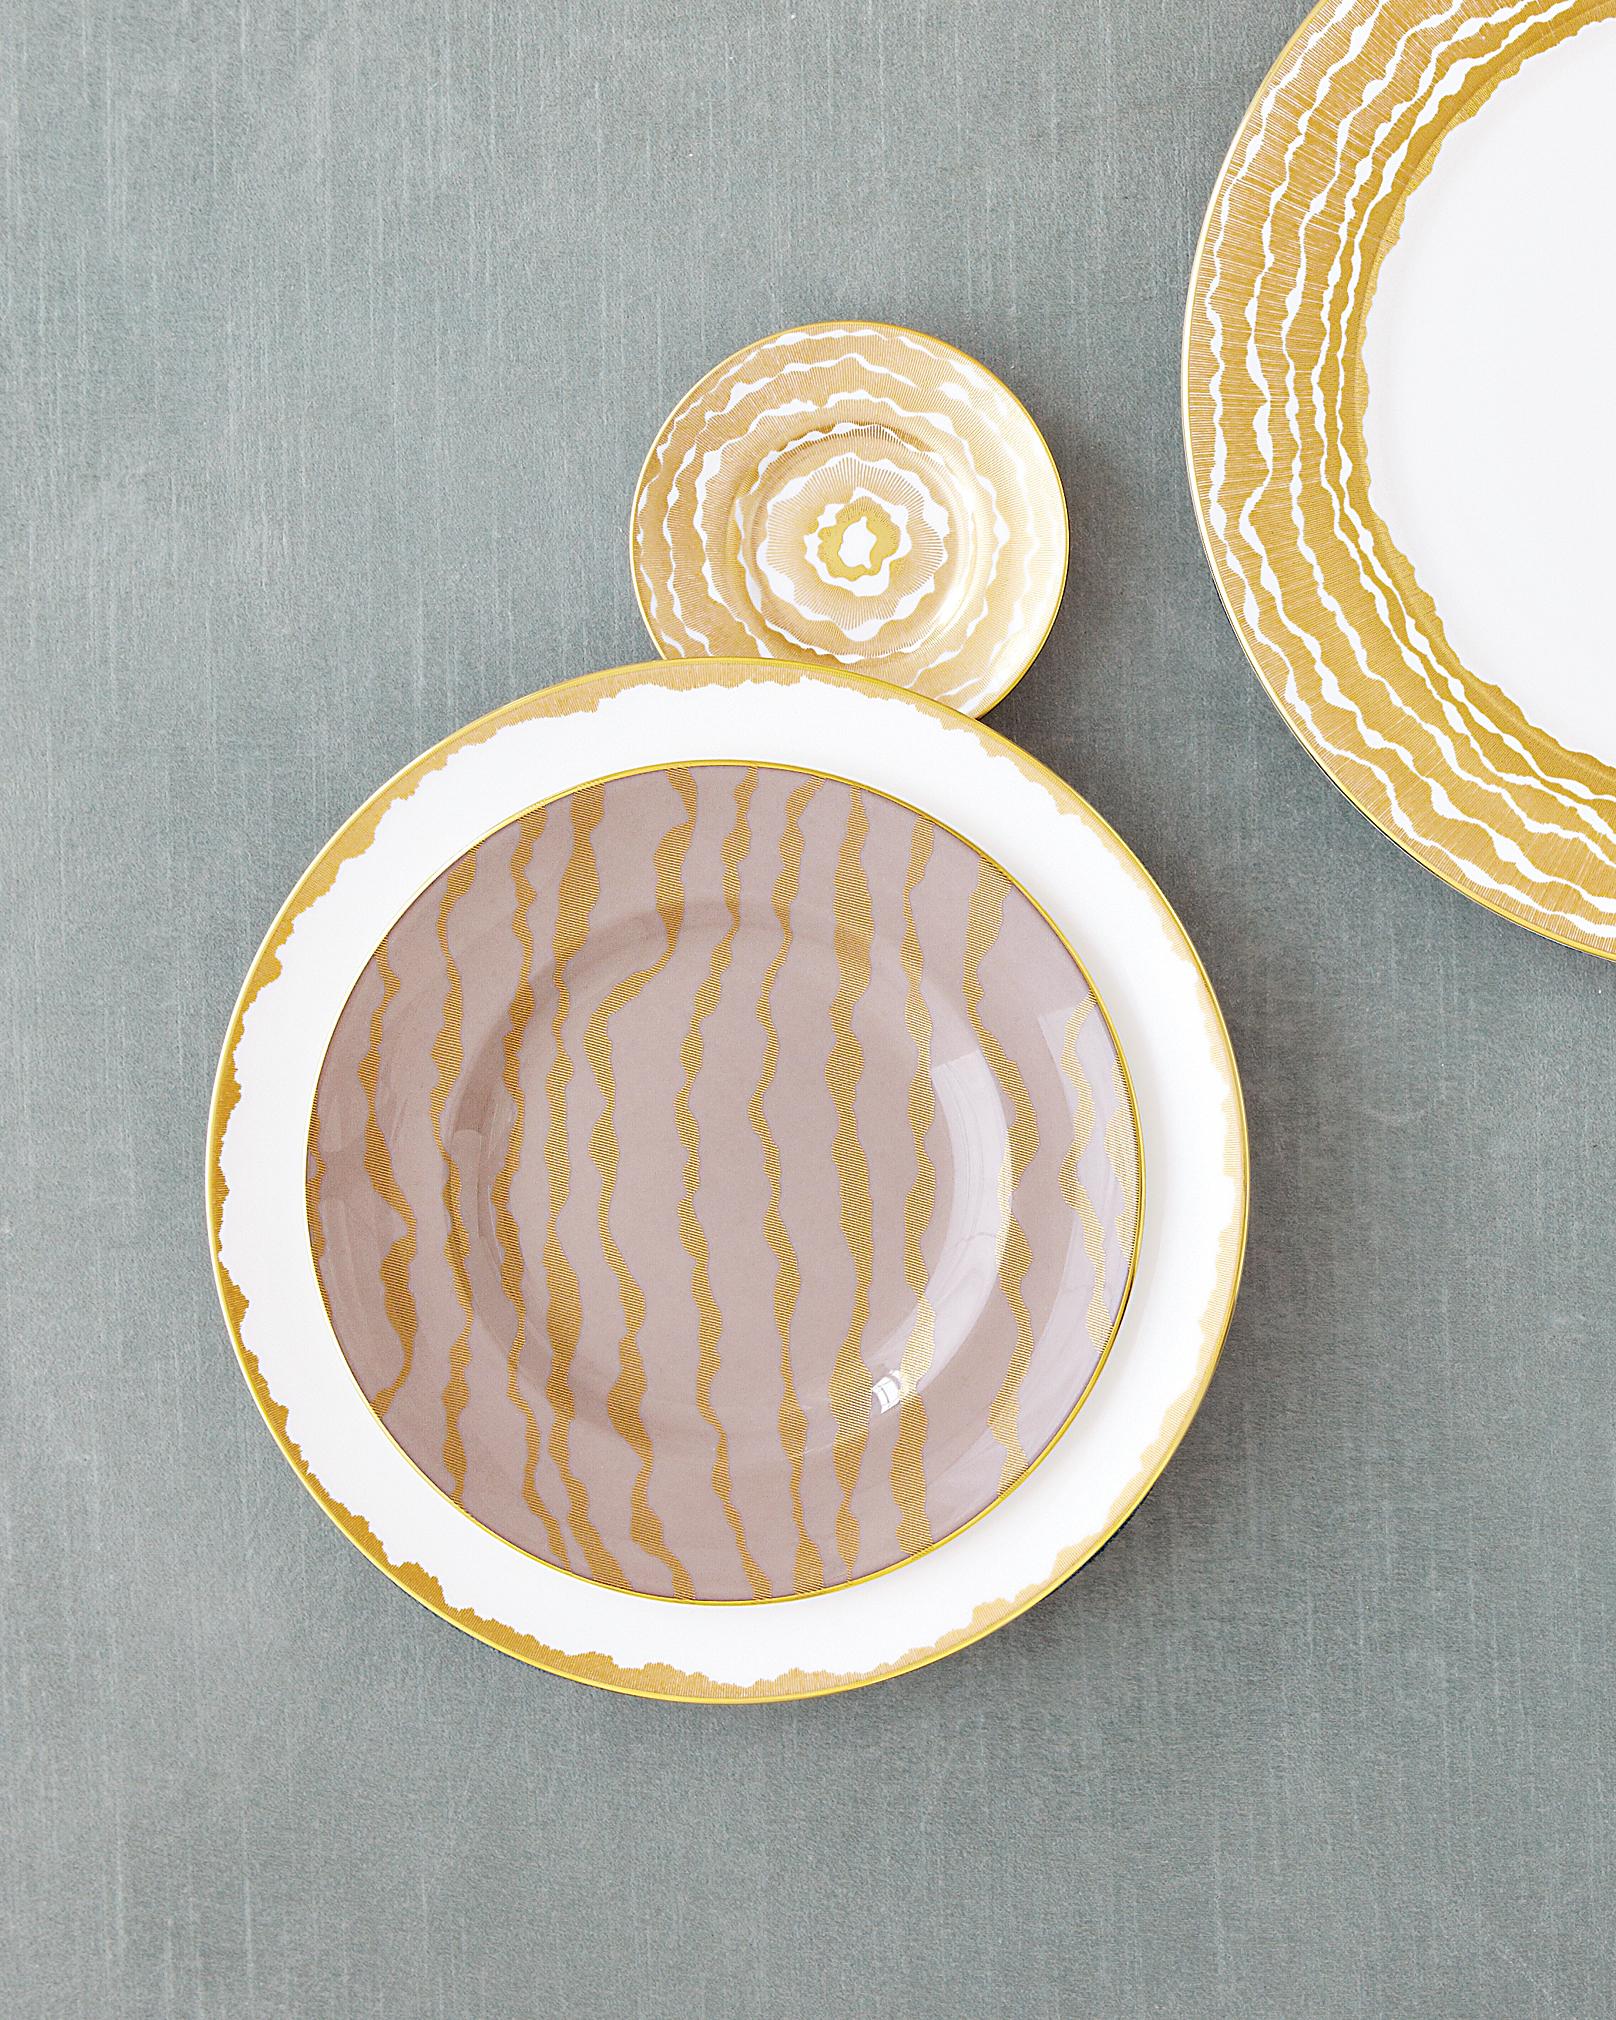 dinnerware-2-0811mwd107434.jpg